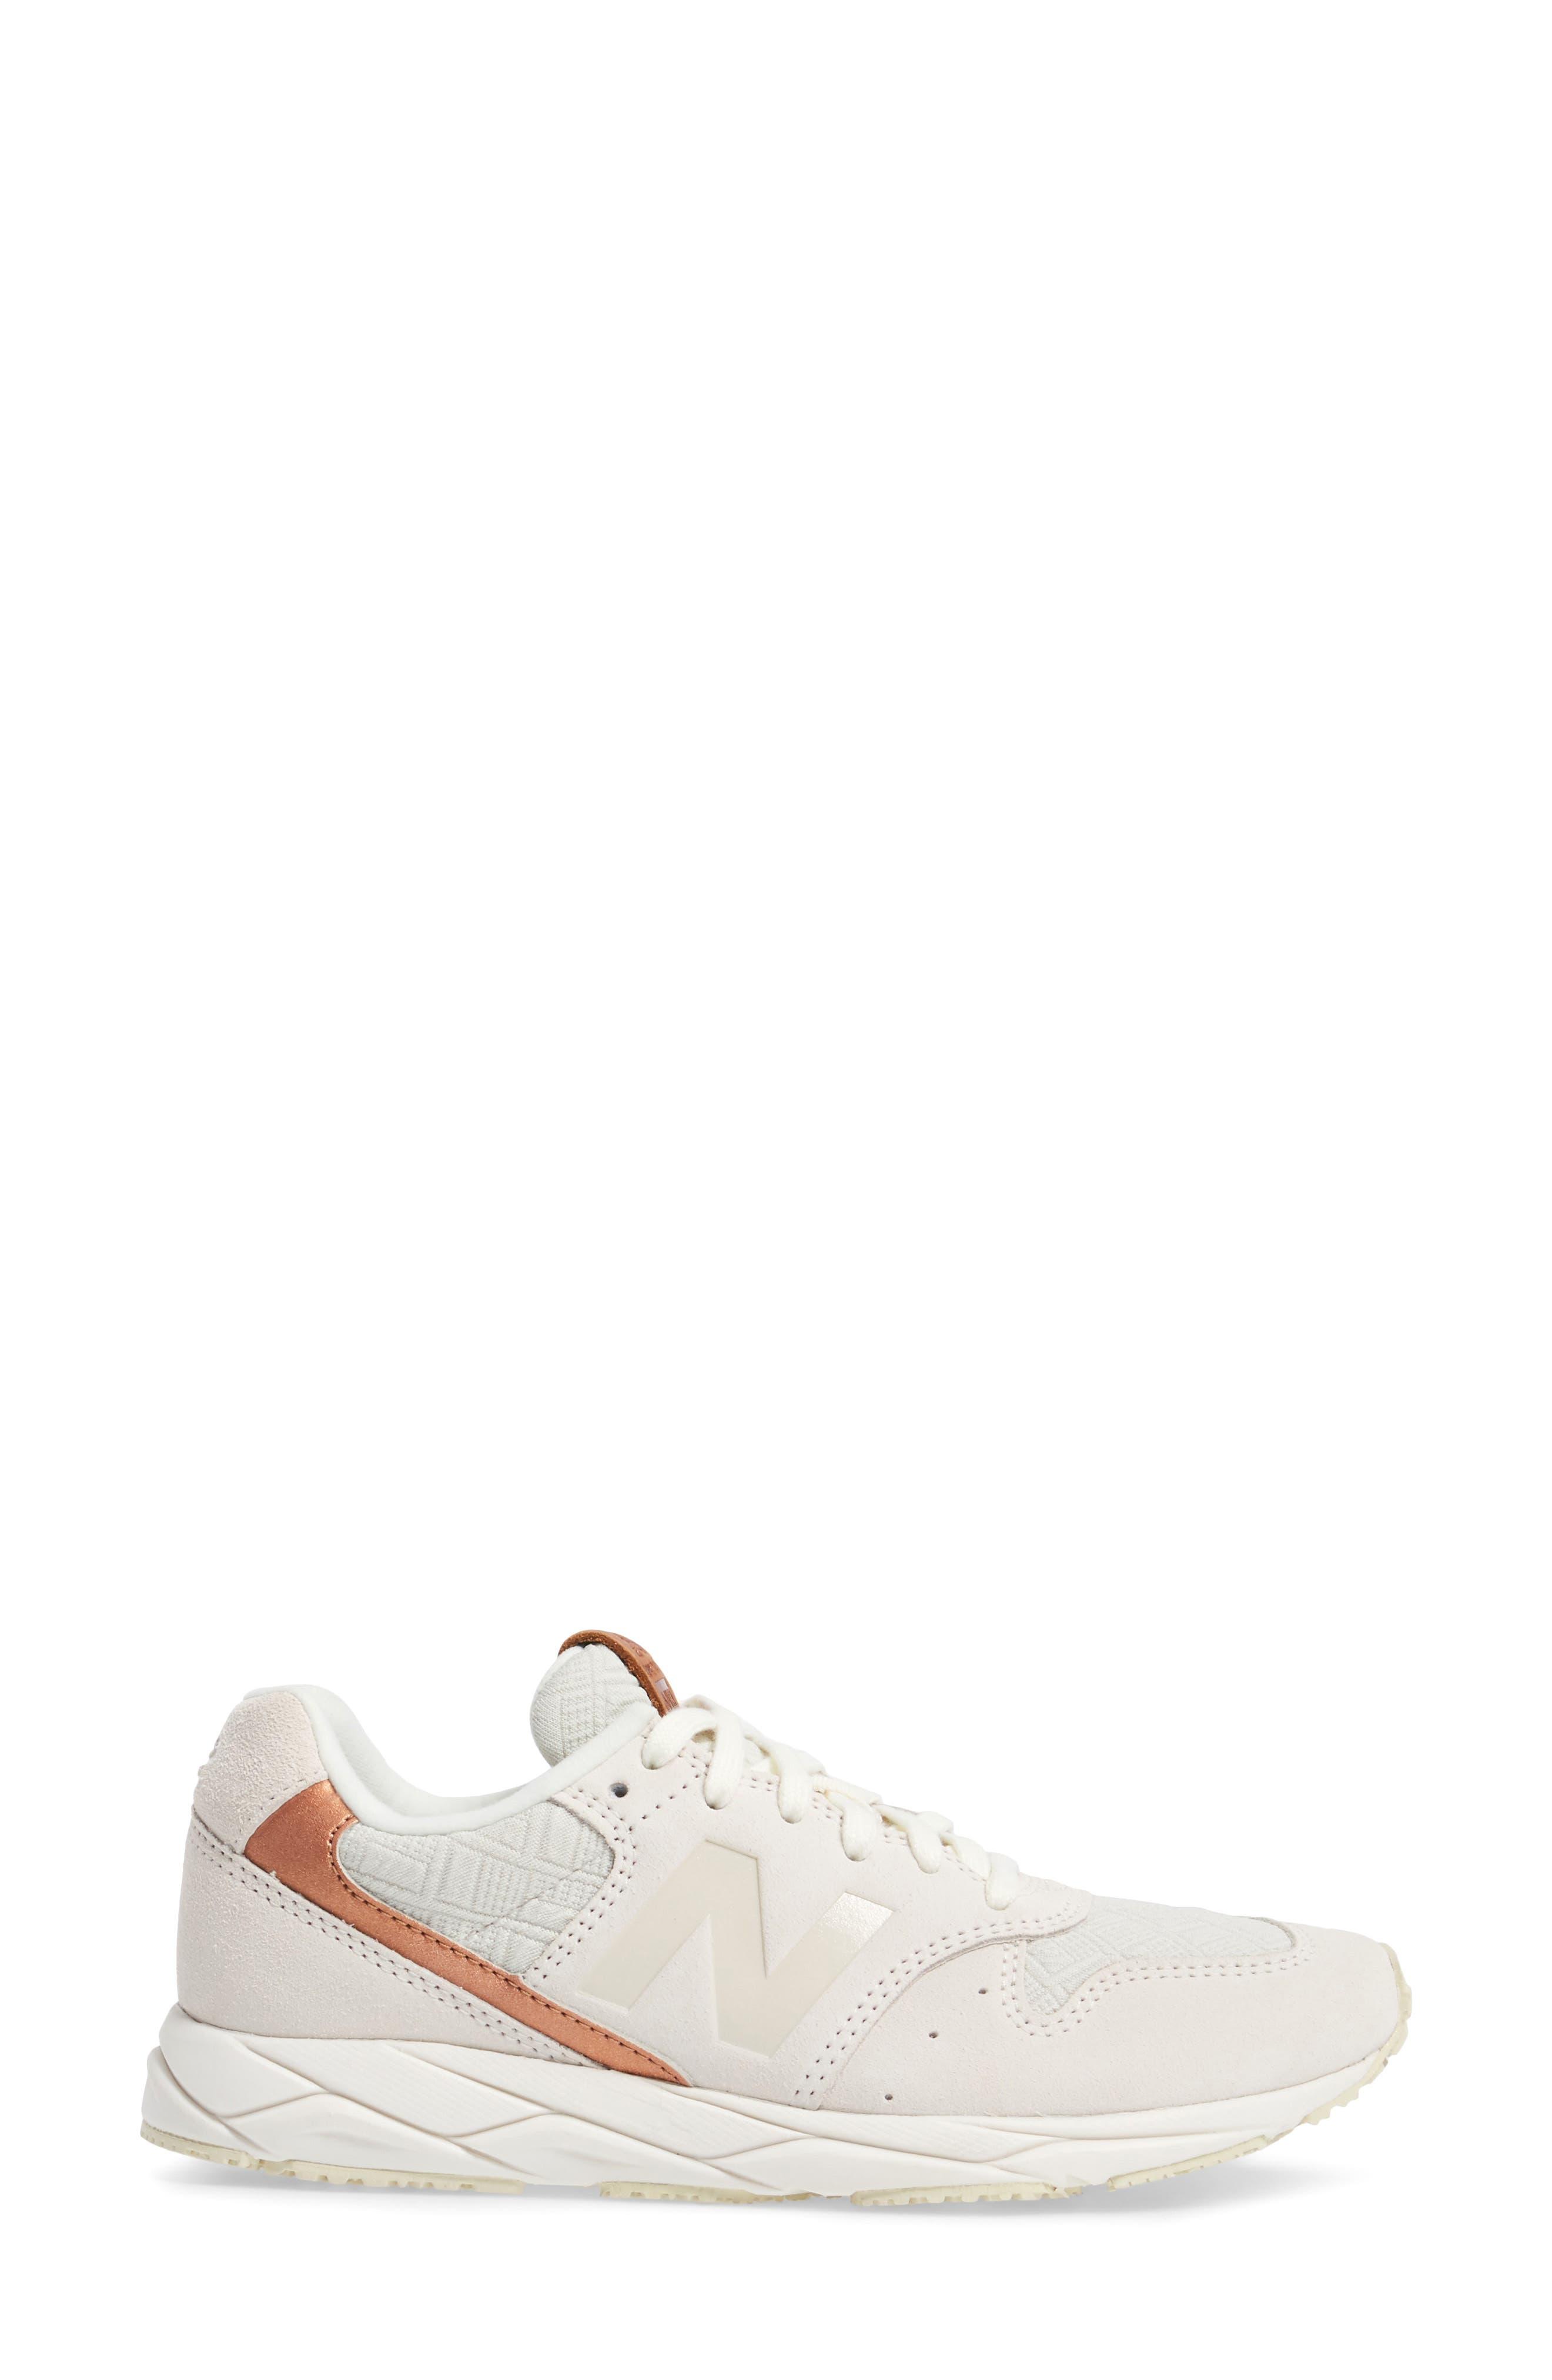 96 Mash-Up Sneaker,                             Alternate thumbnail 3, color,                             Sea Salt